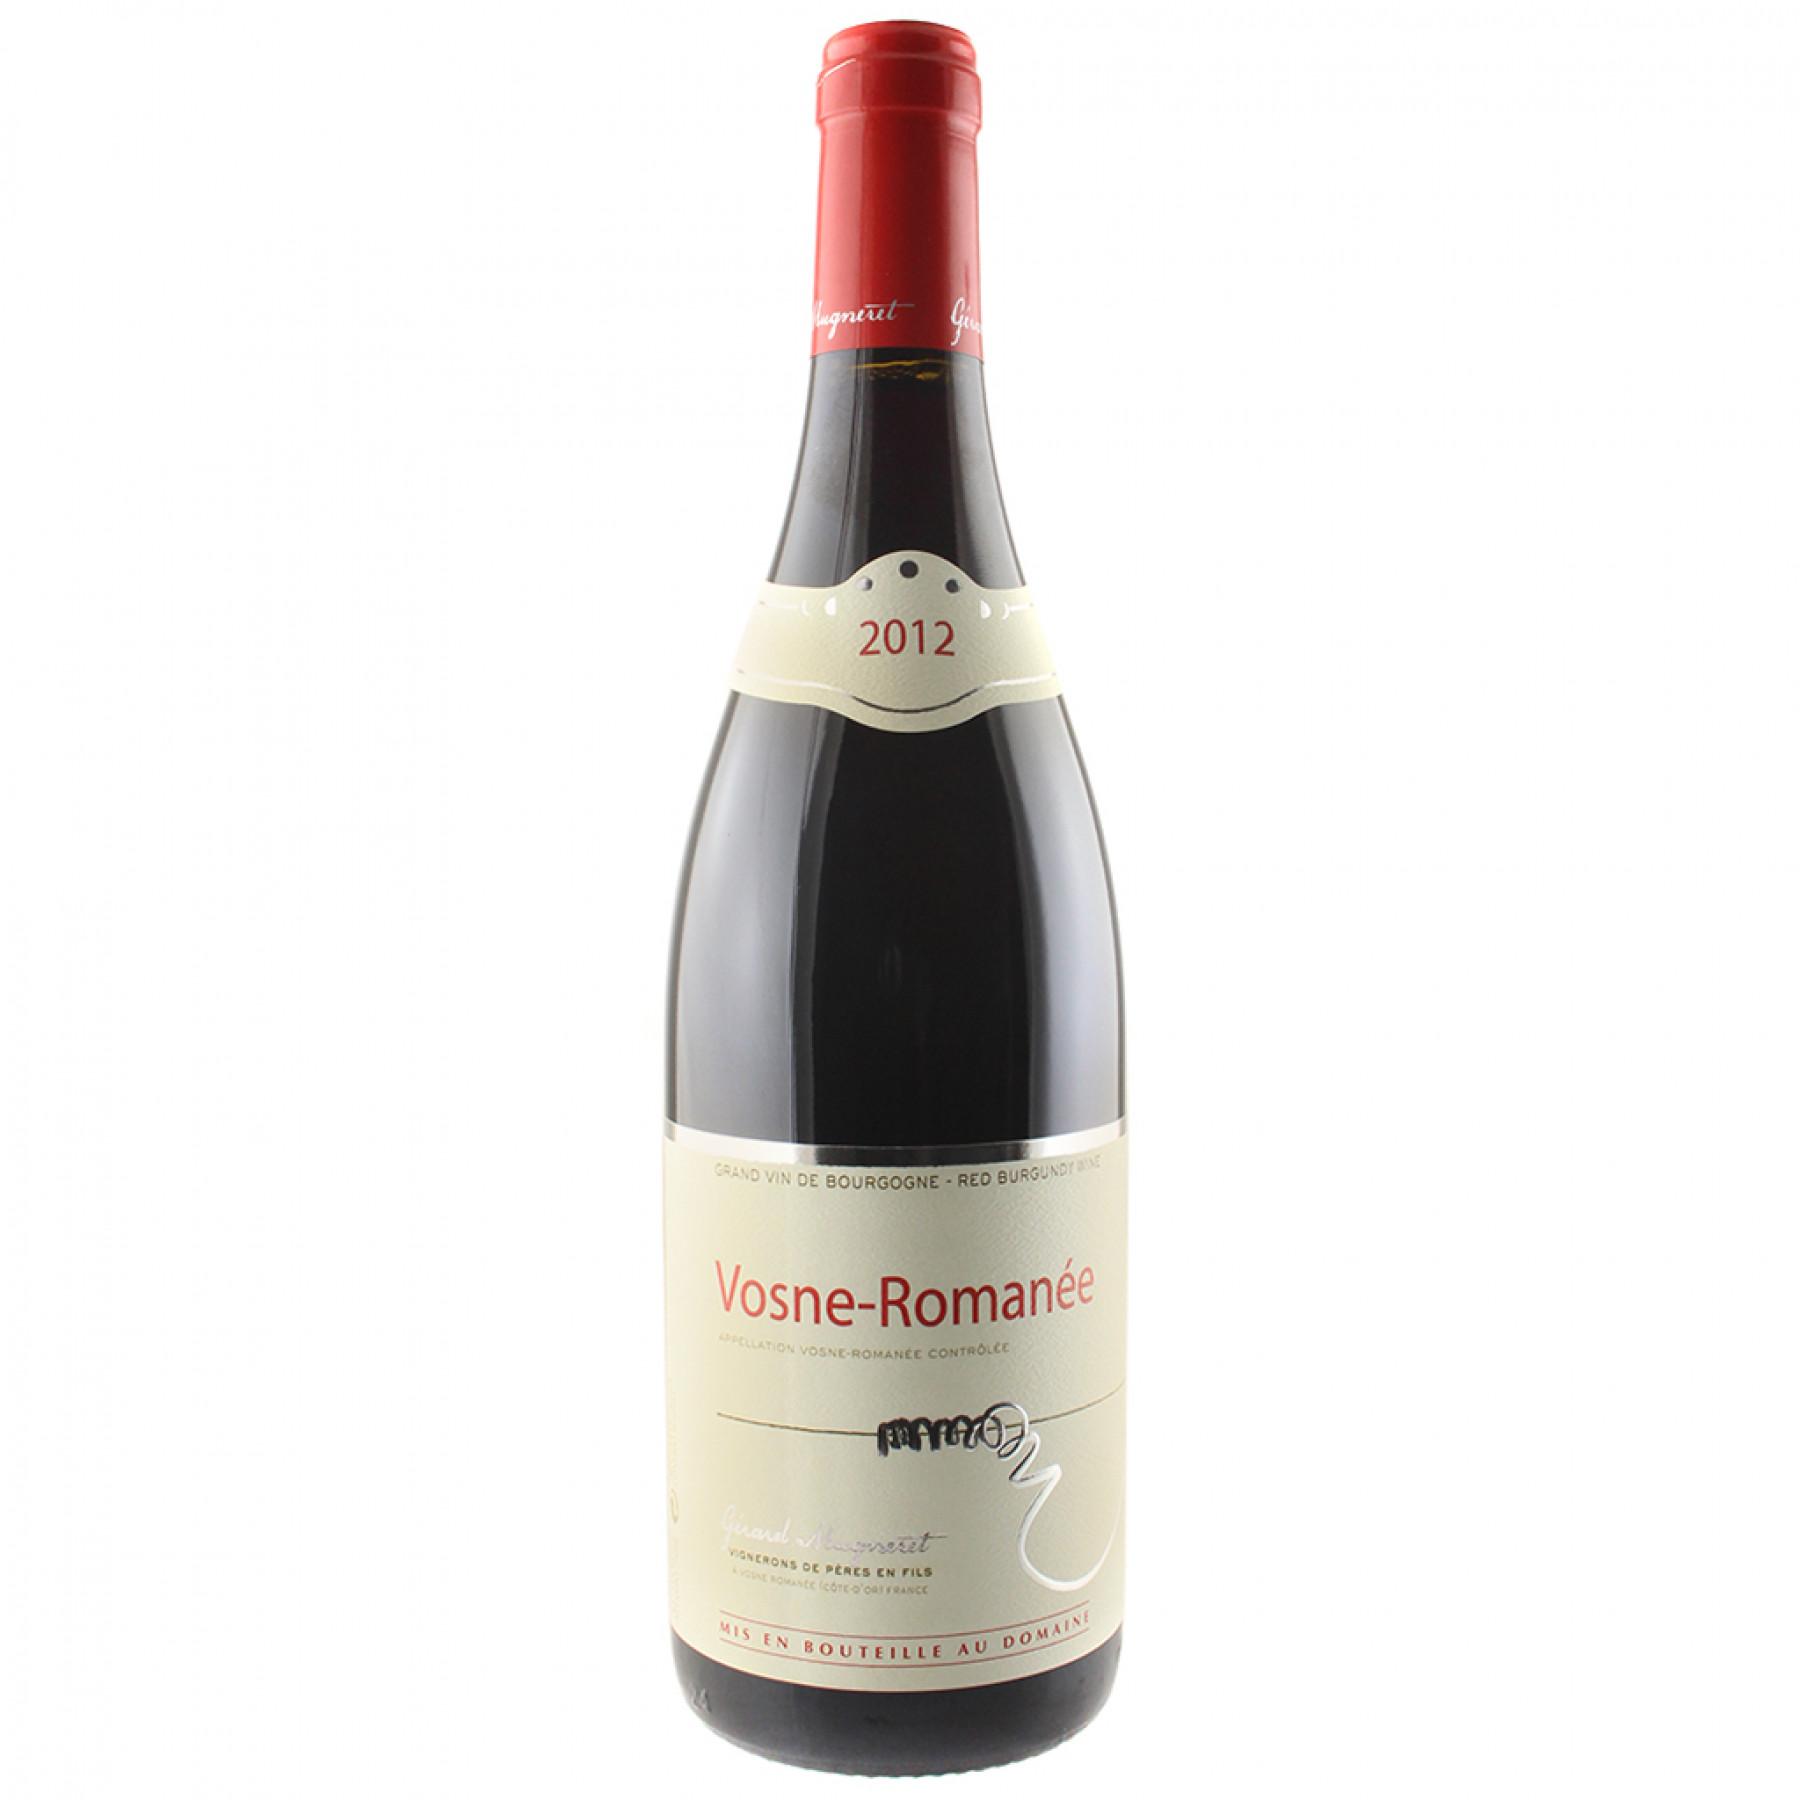 Vino rosso Vosne Romanée